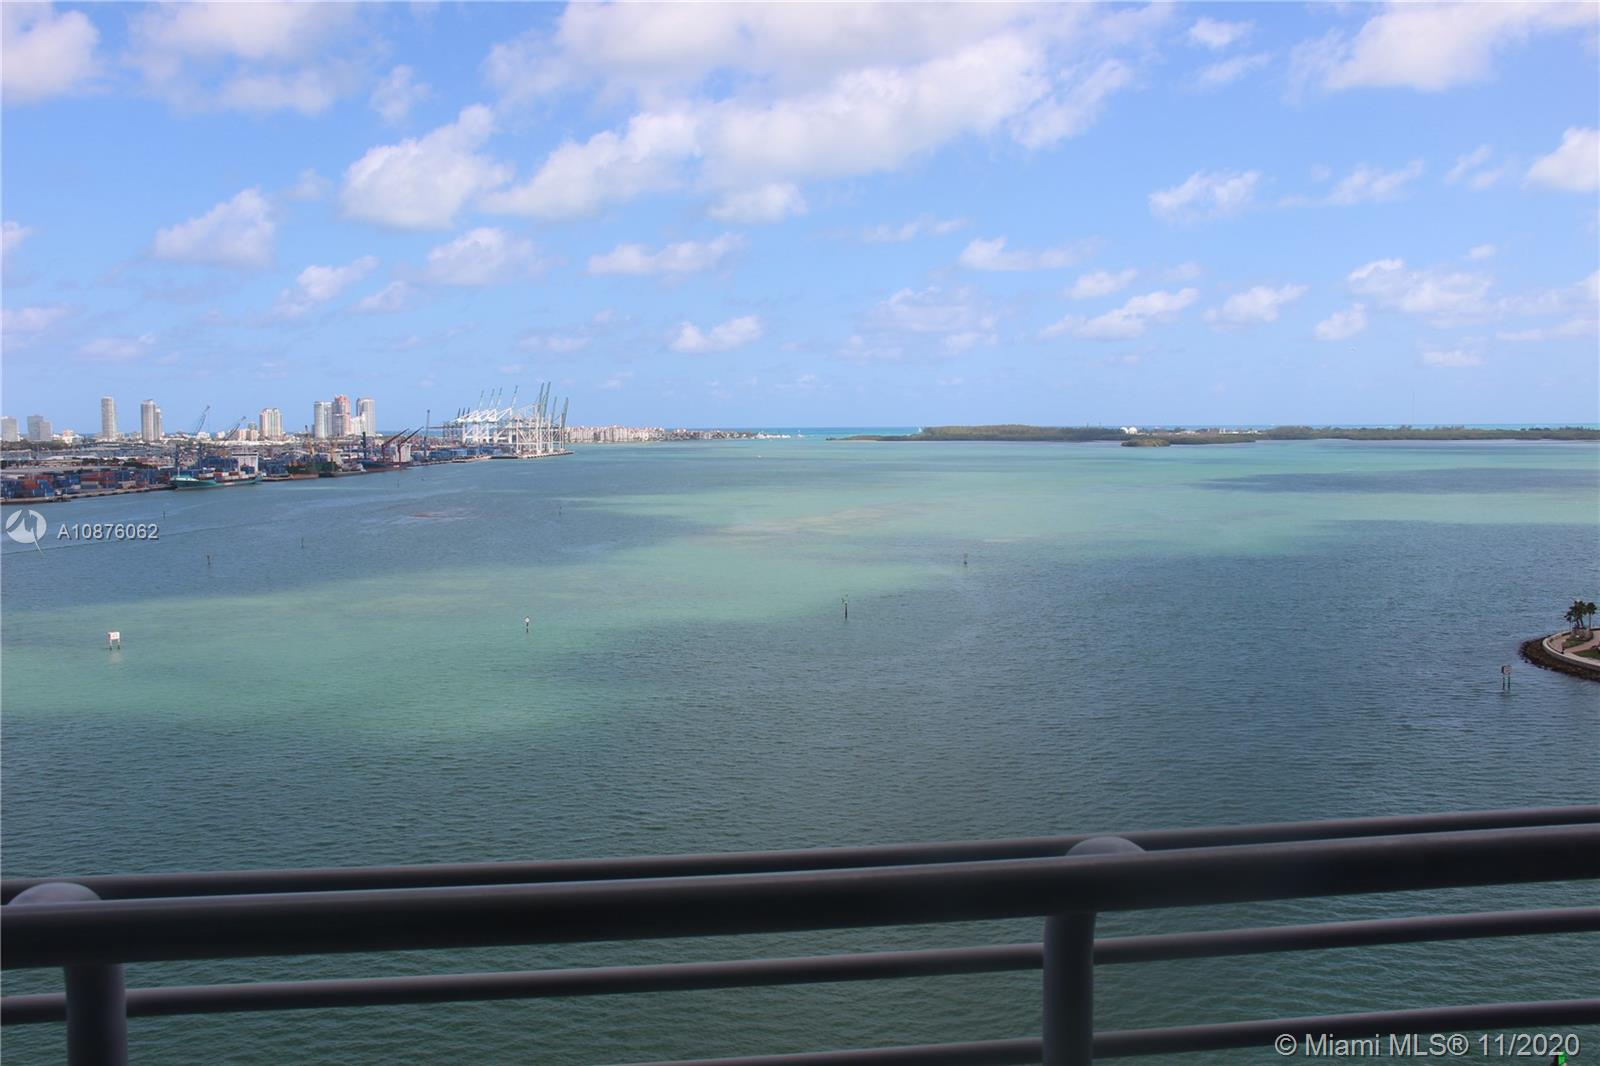 One Miami East #1712 - 335 S Biscayne Blvd #1712, Miami, FL 33131